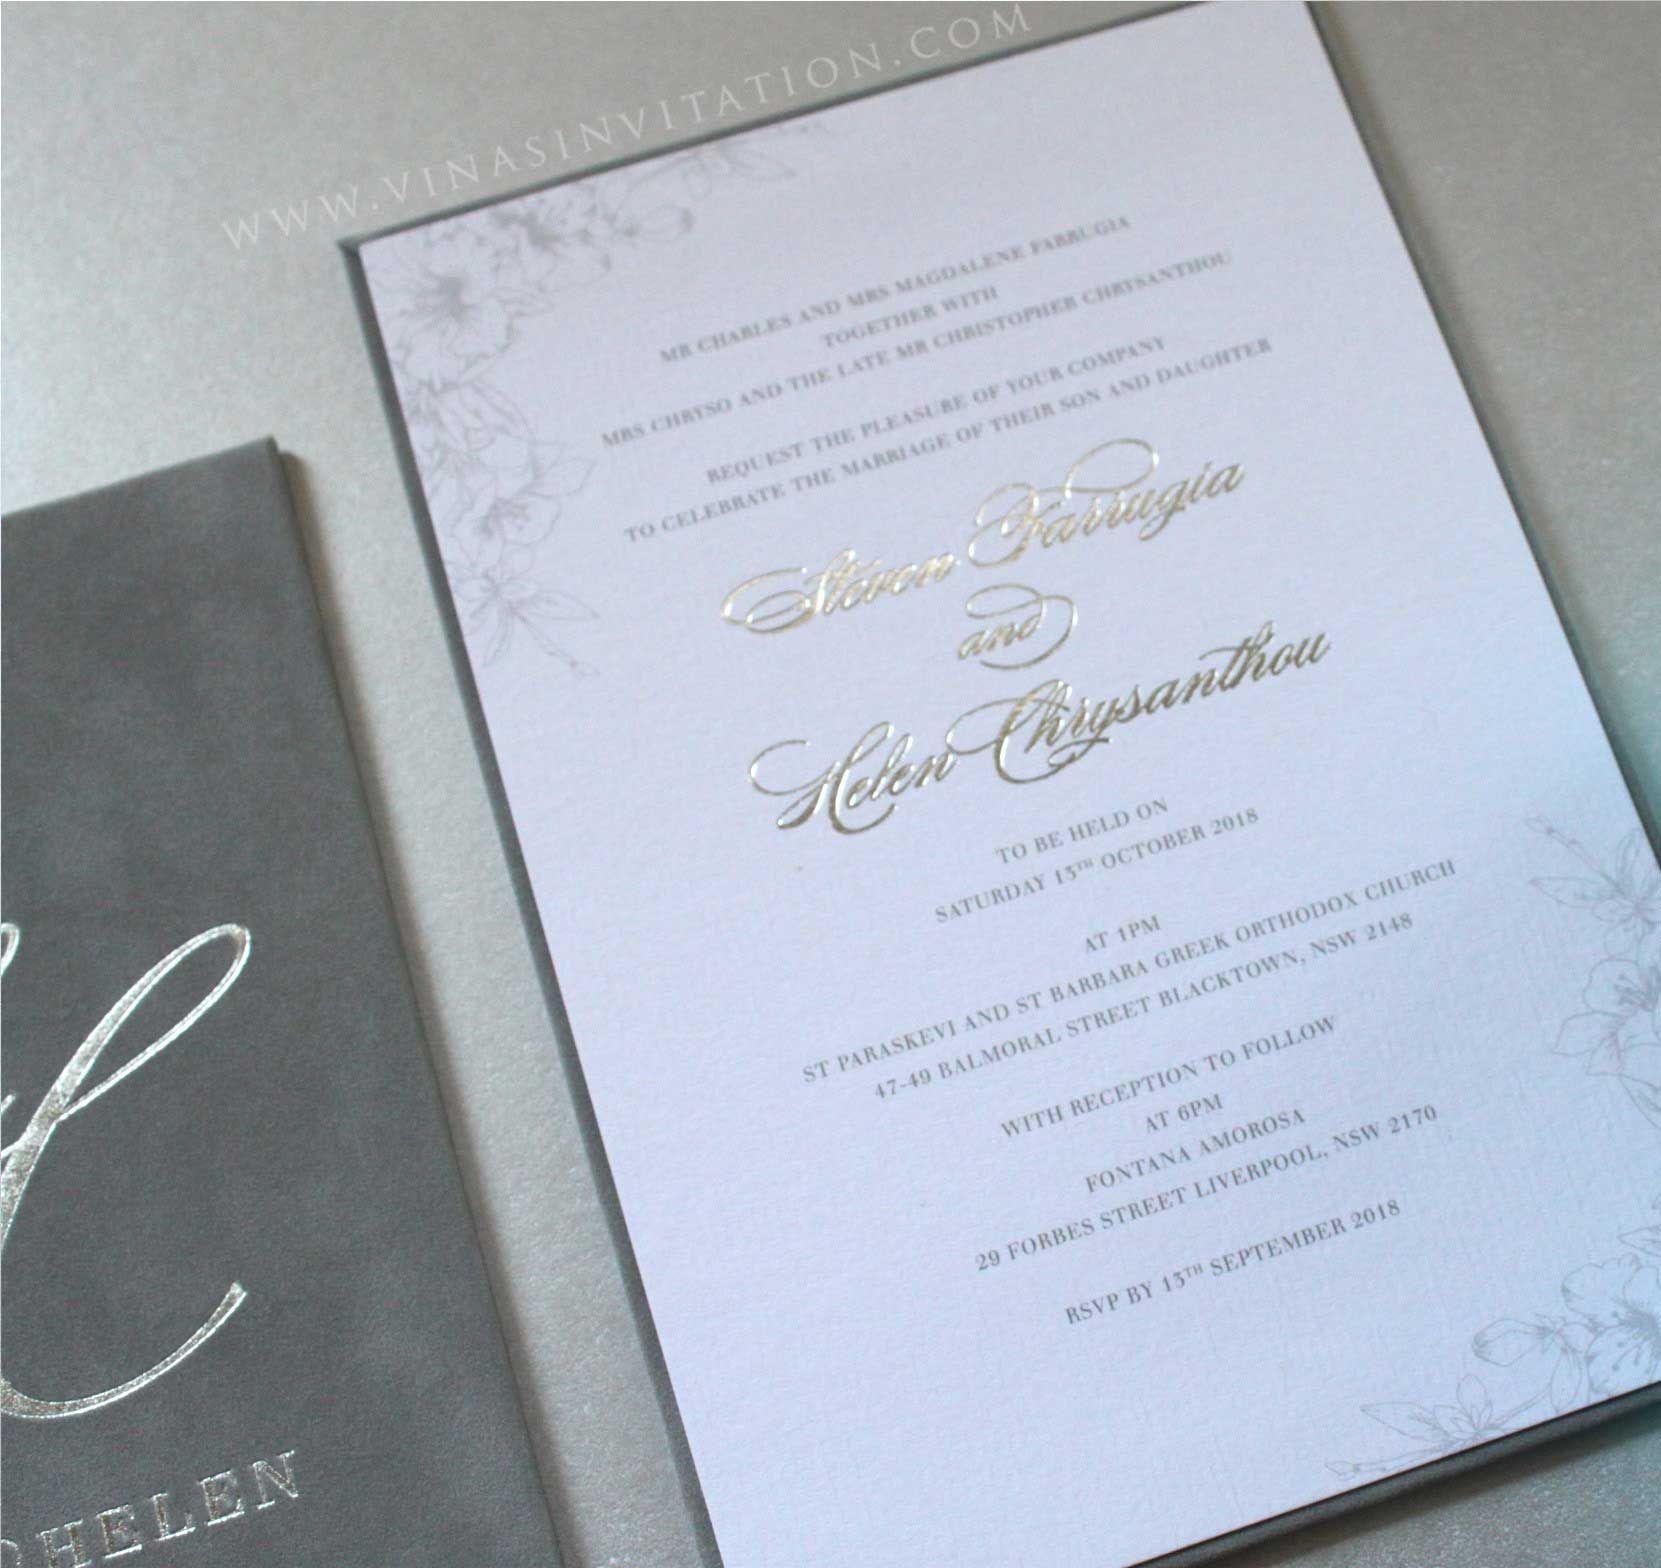 vinas invitation. suede finish invitation. sydney wedding